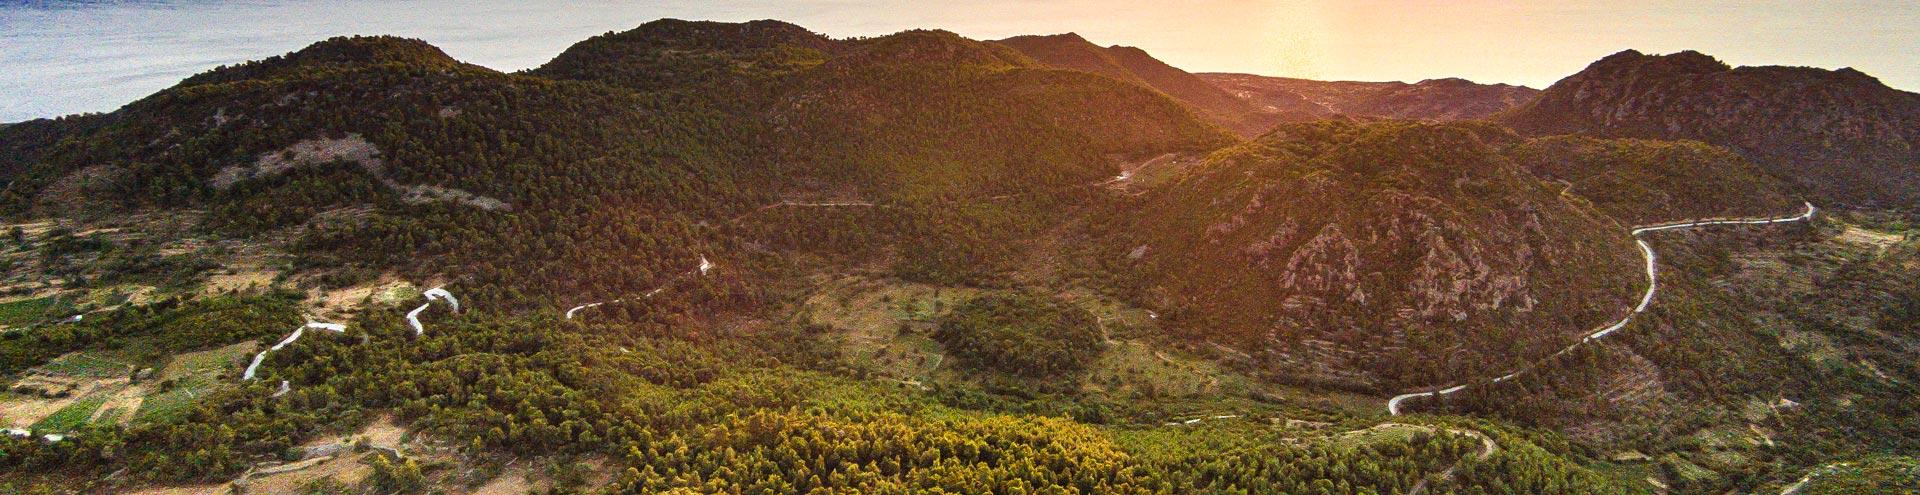 Vulkanhalbinsel Methana